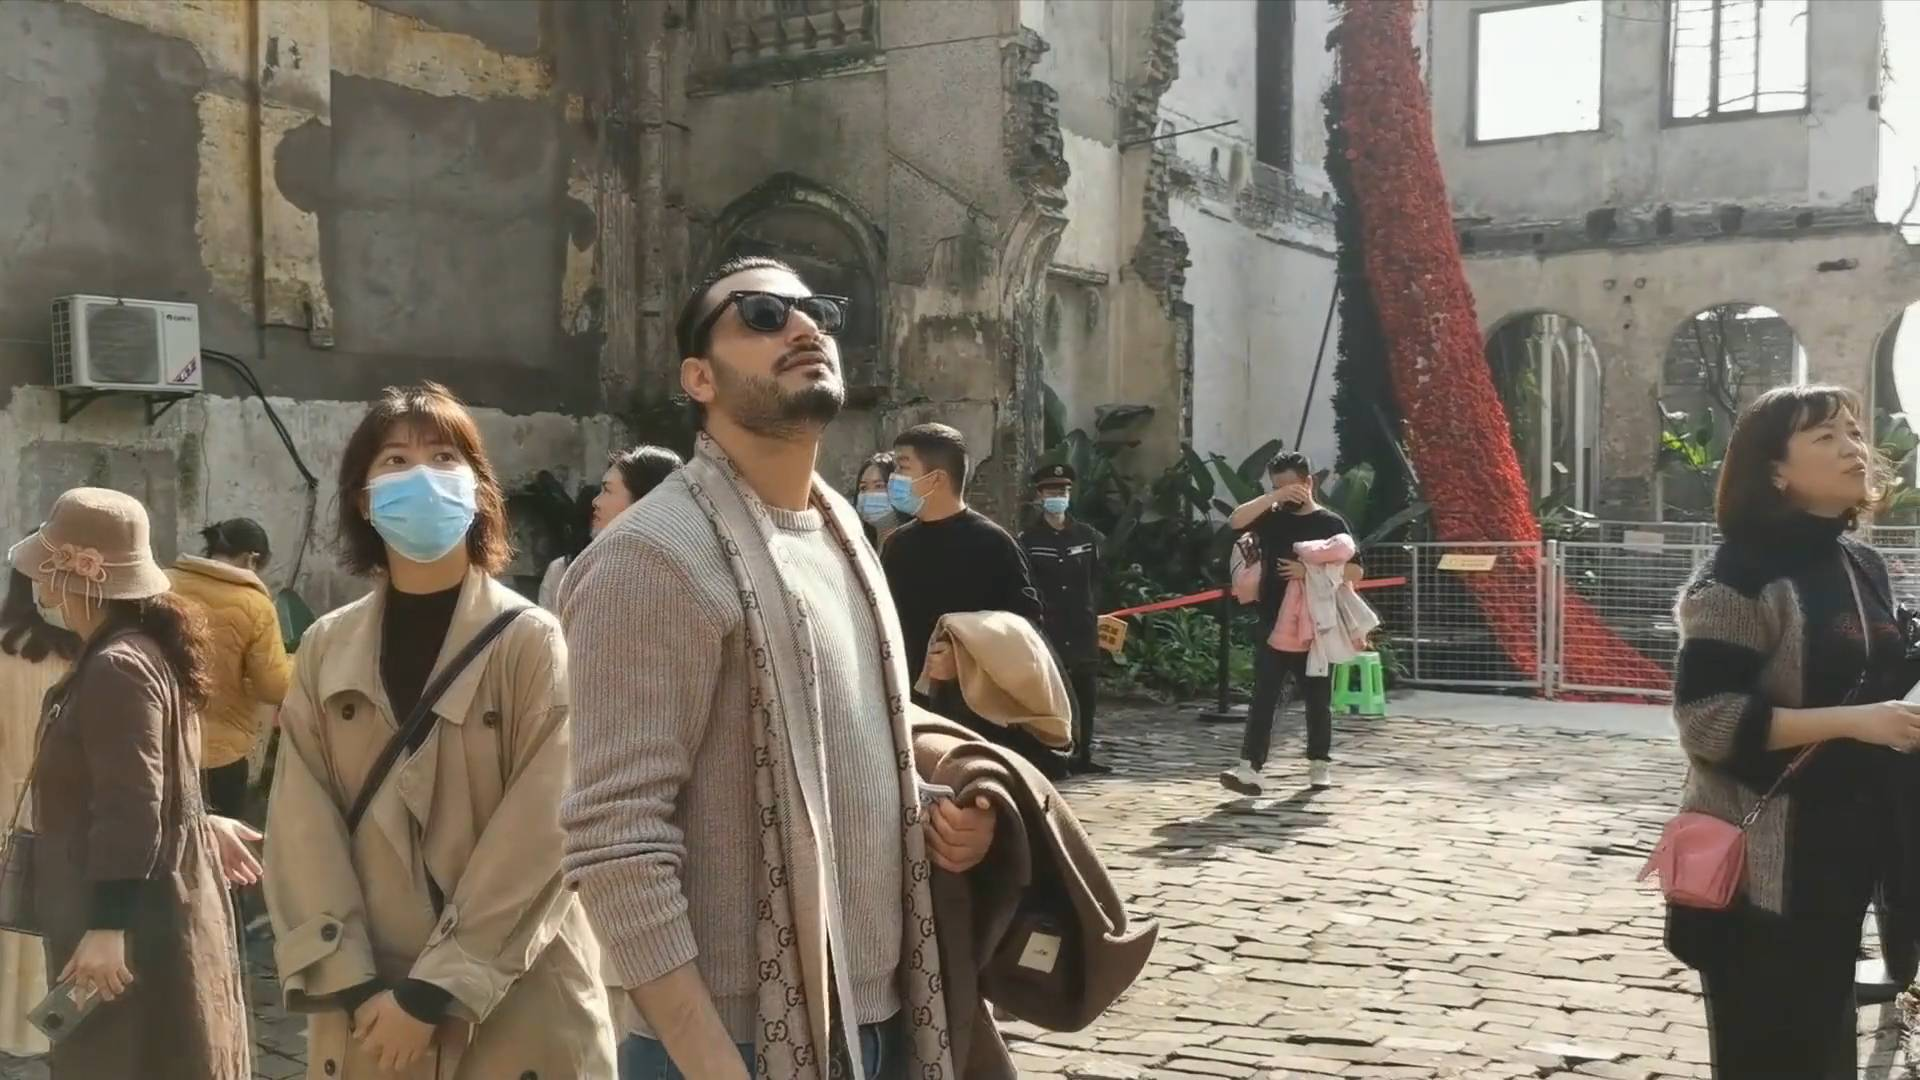 GLOBALink | Meet Syrian architect in China's mountain city, Chongqing